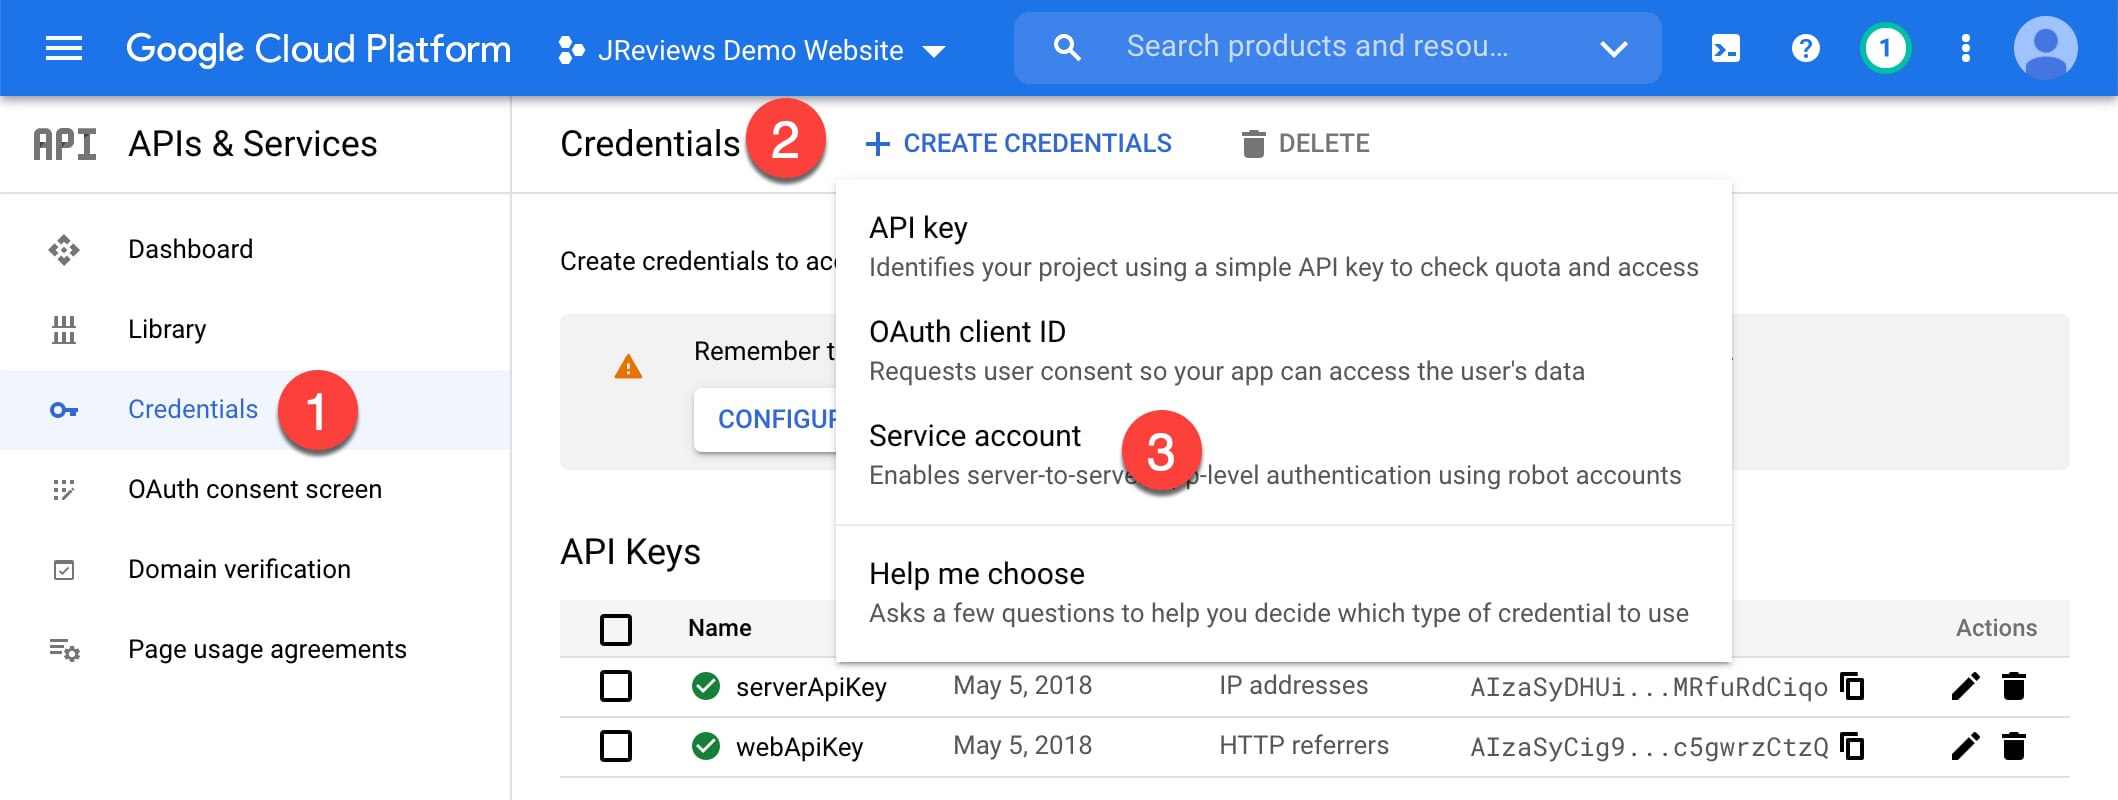 Create a new Service Account